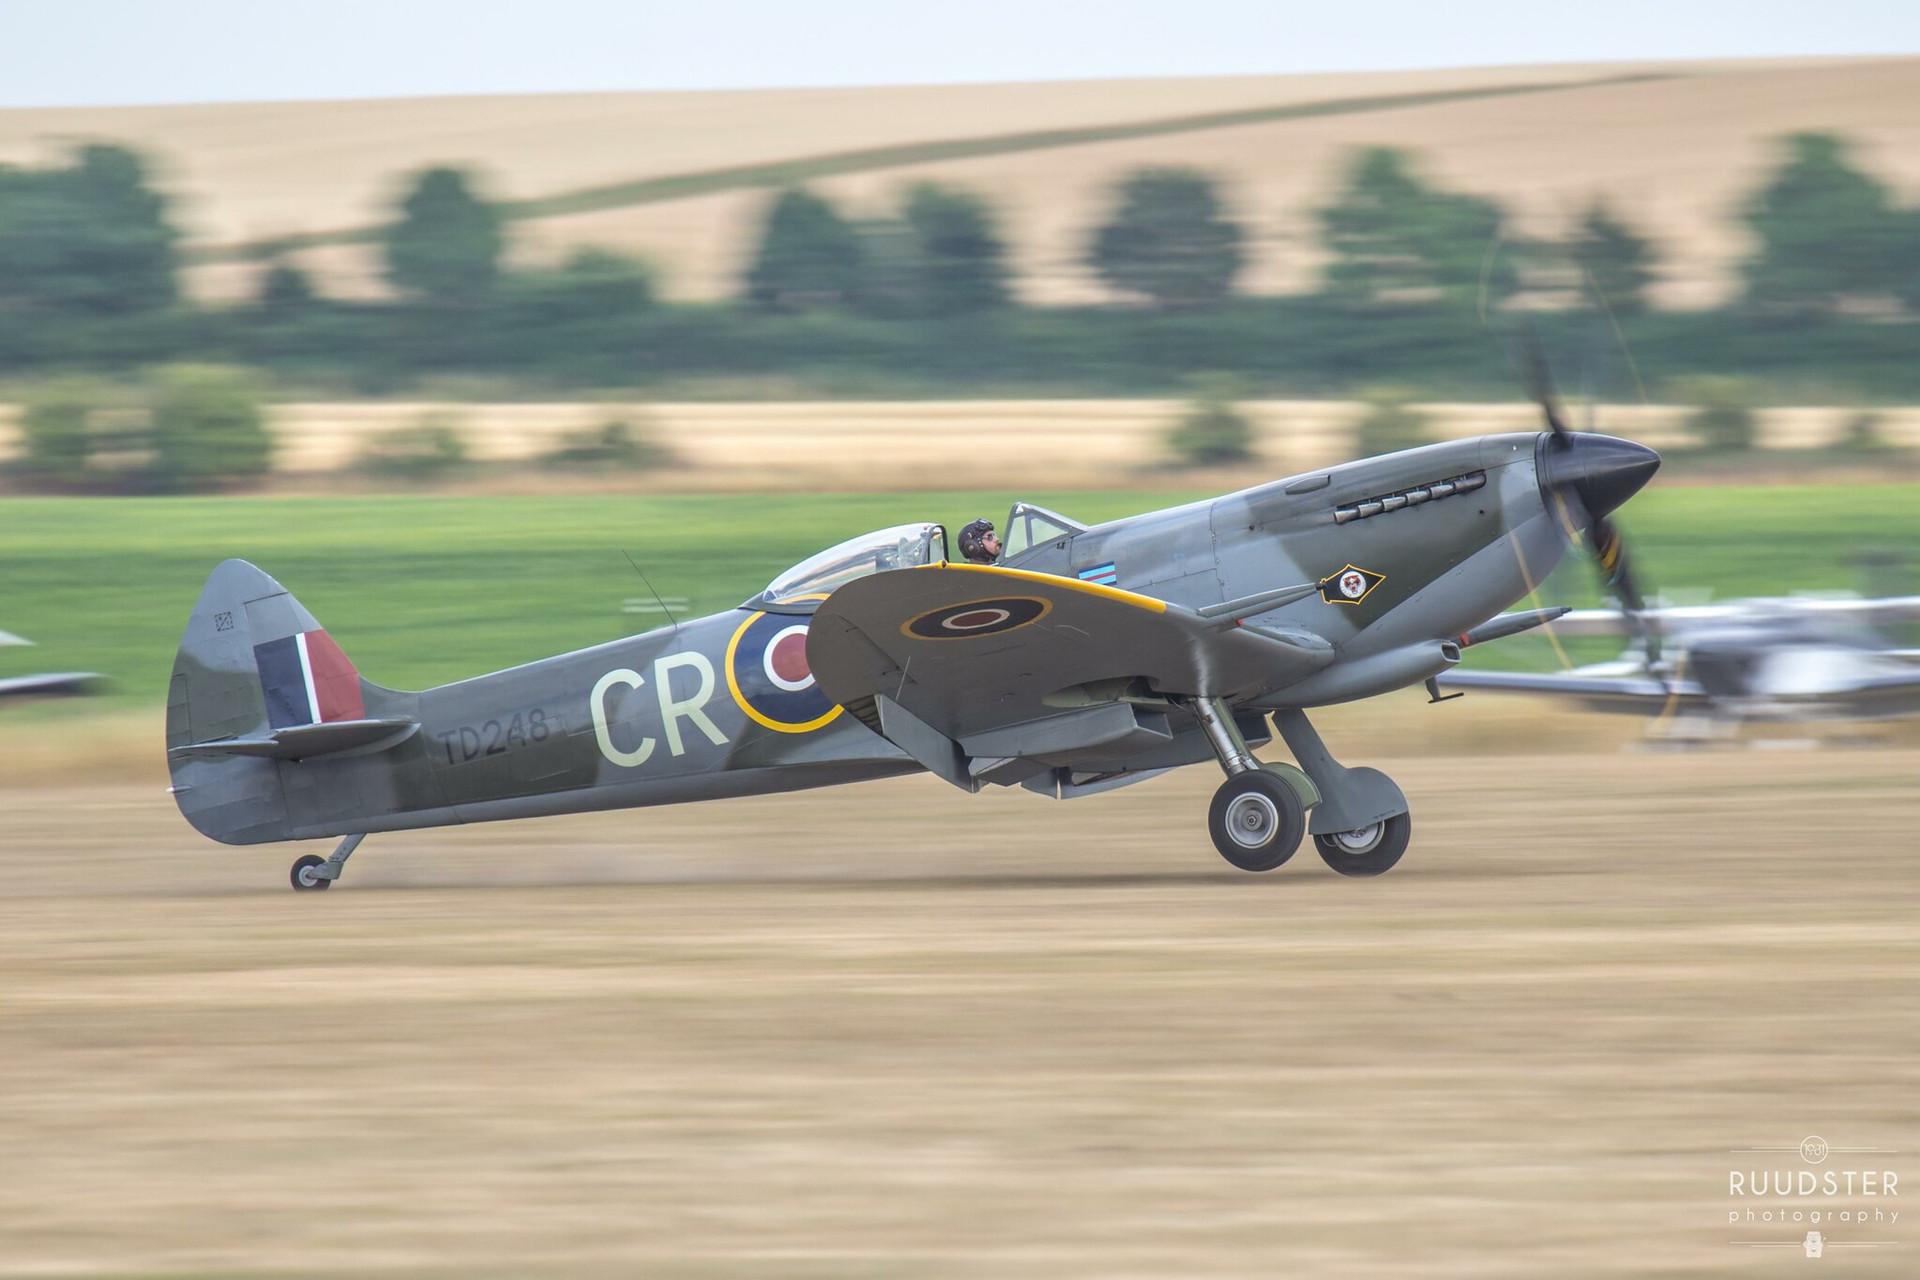 TD248 / G-OXVI   Build: 1945 - Supermarine Spitfire Mk.XVI